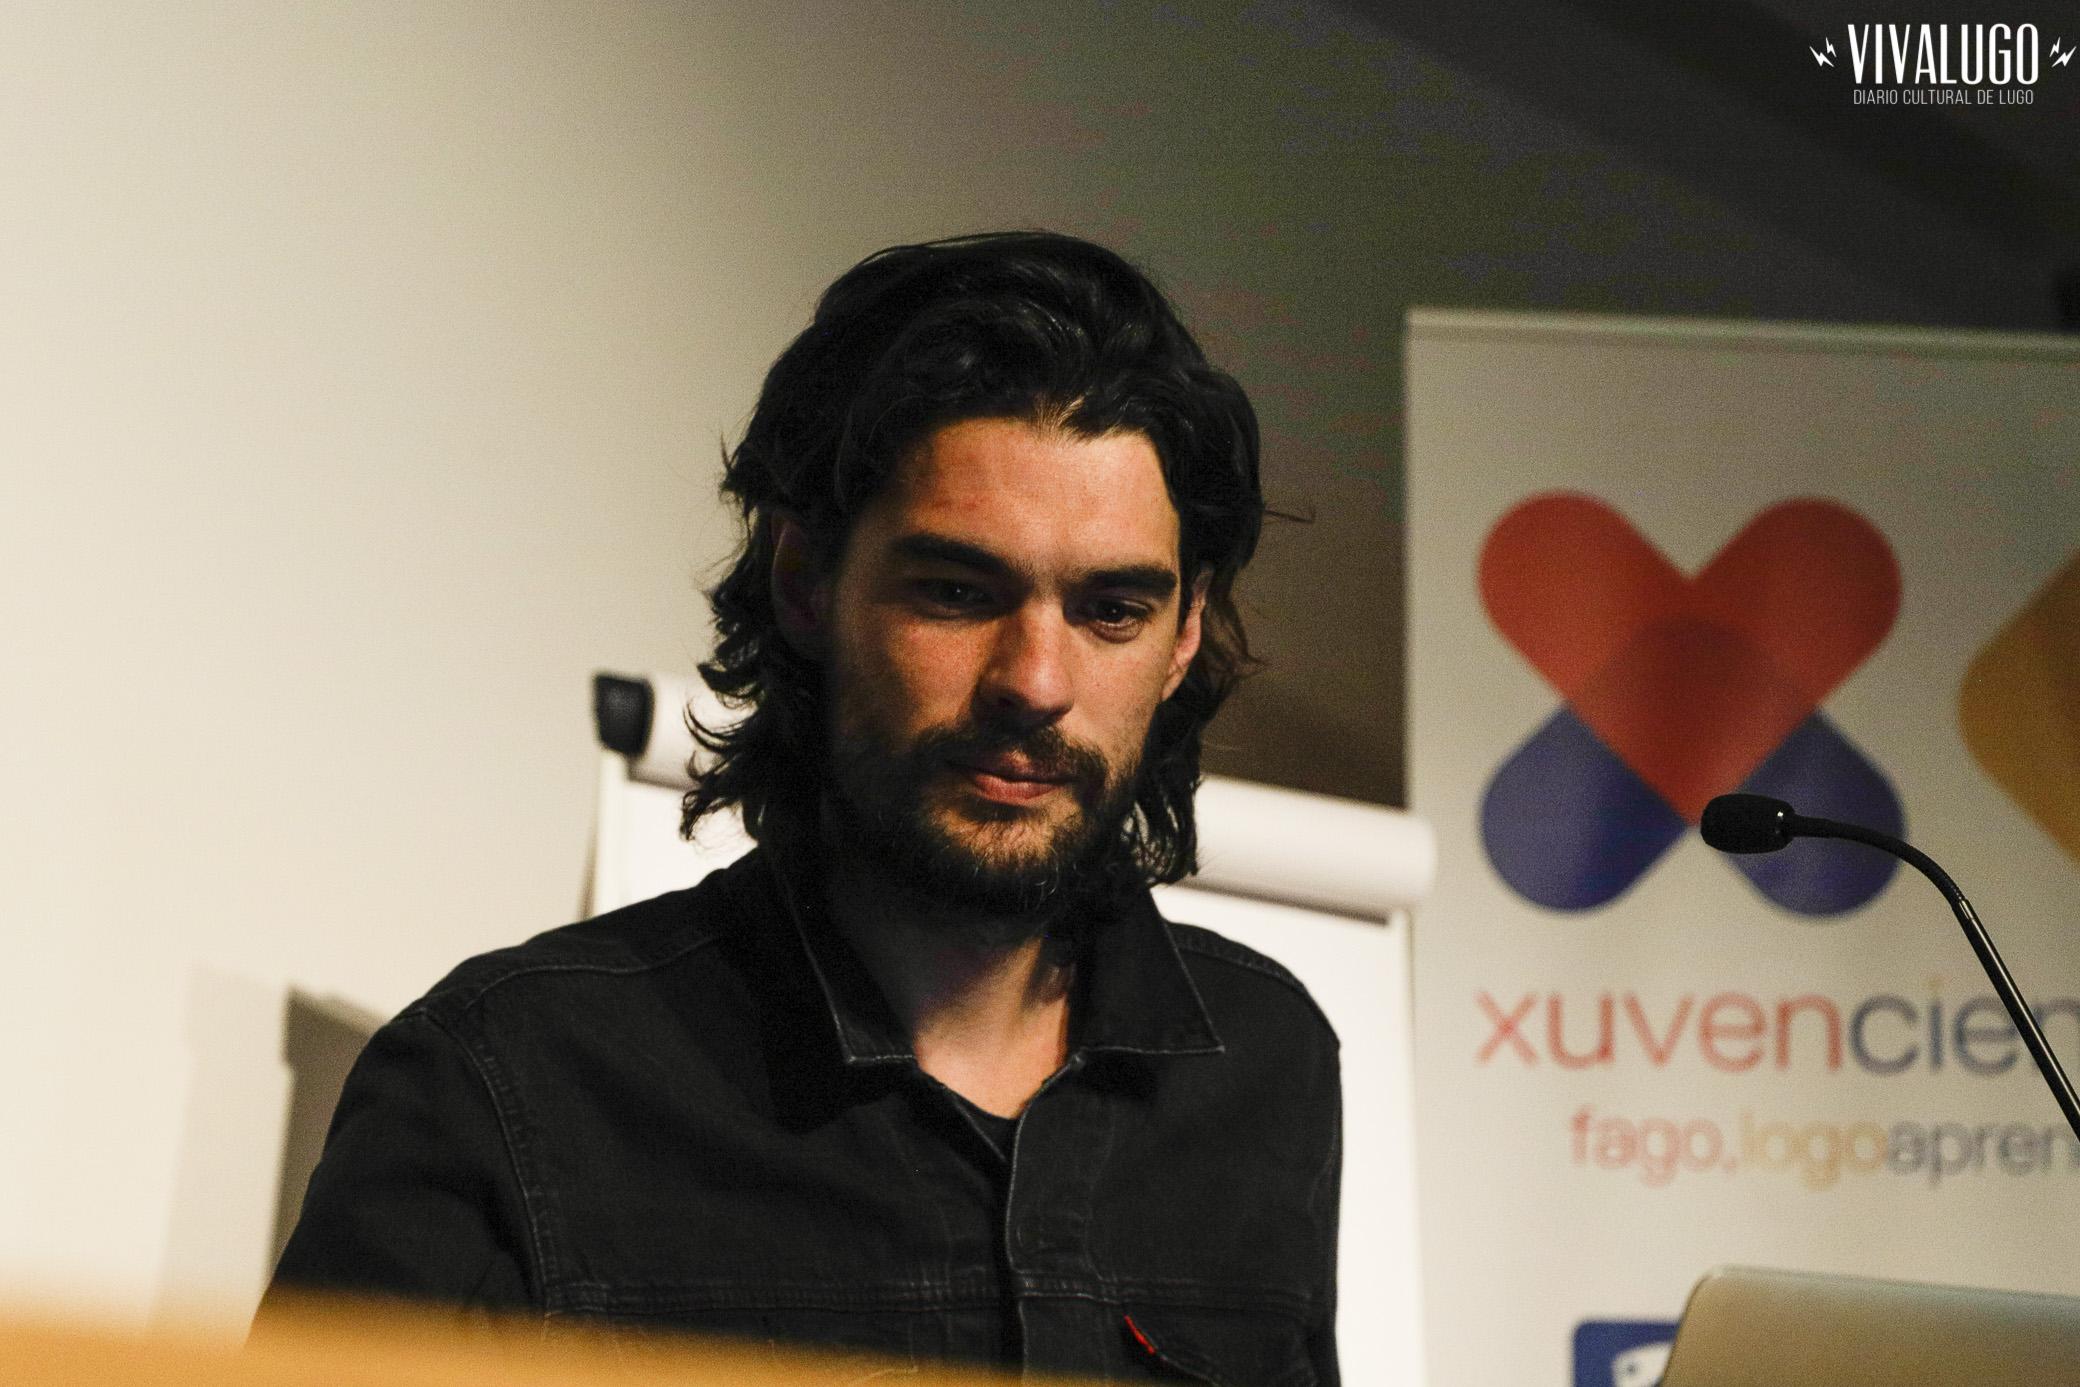 Foto de Loopez para Viva Lugo - Oliver Laxe.